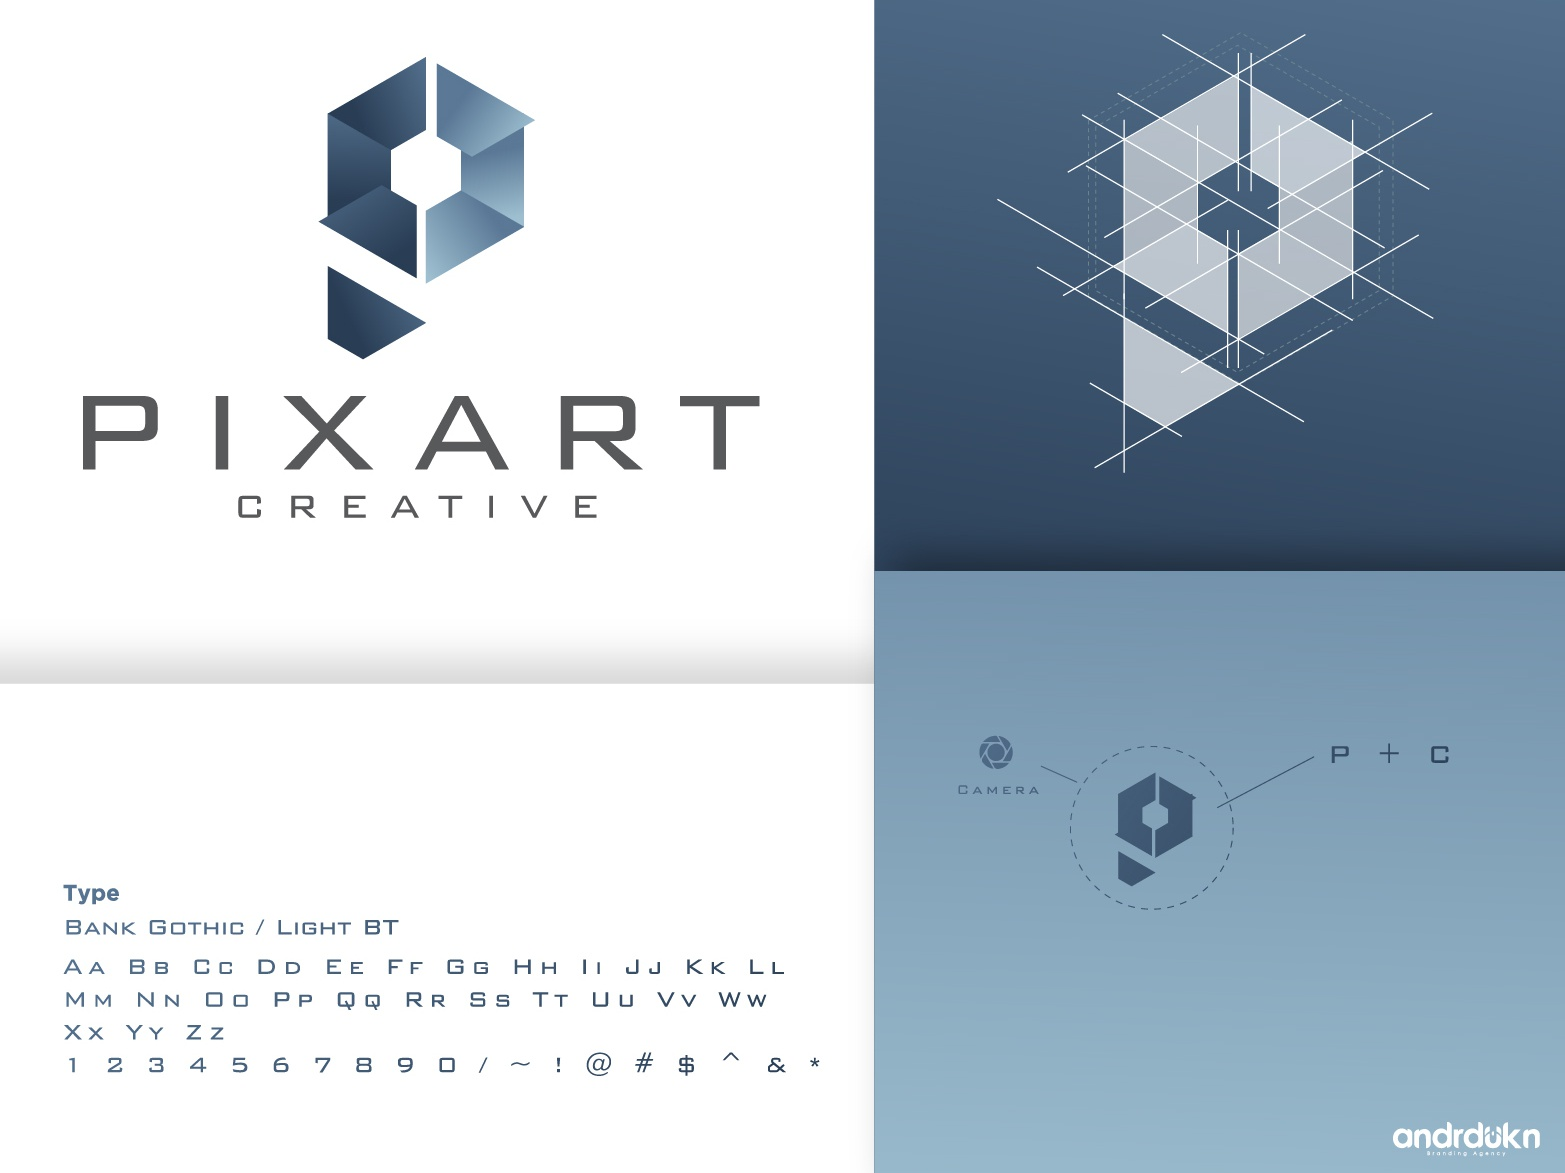 Pixart Logo By Andredukun On Dribbble,Huawei Mate 10 Porsche Design Box